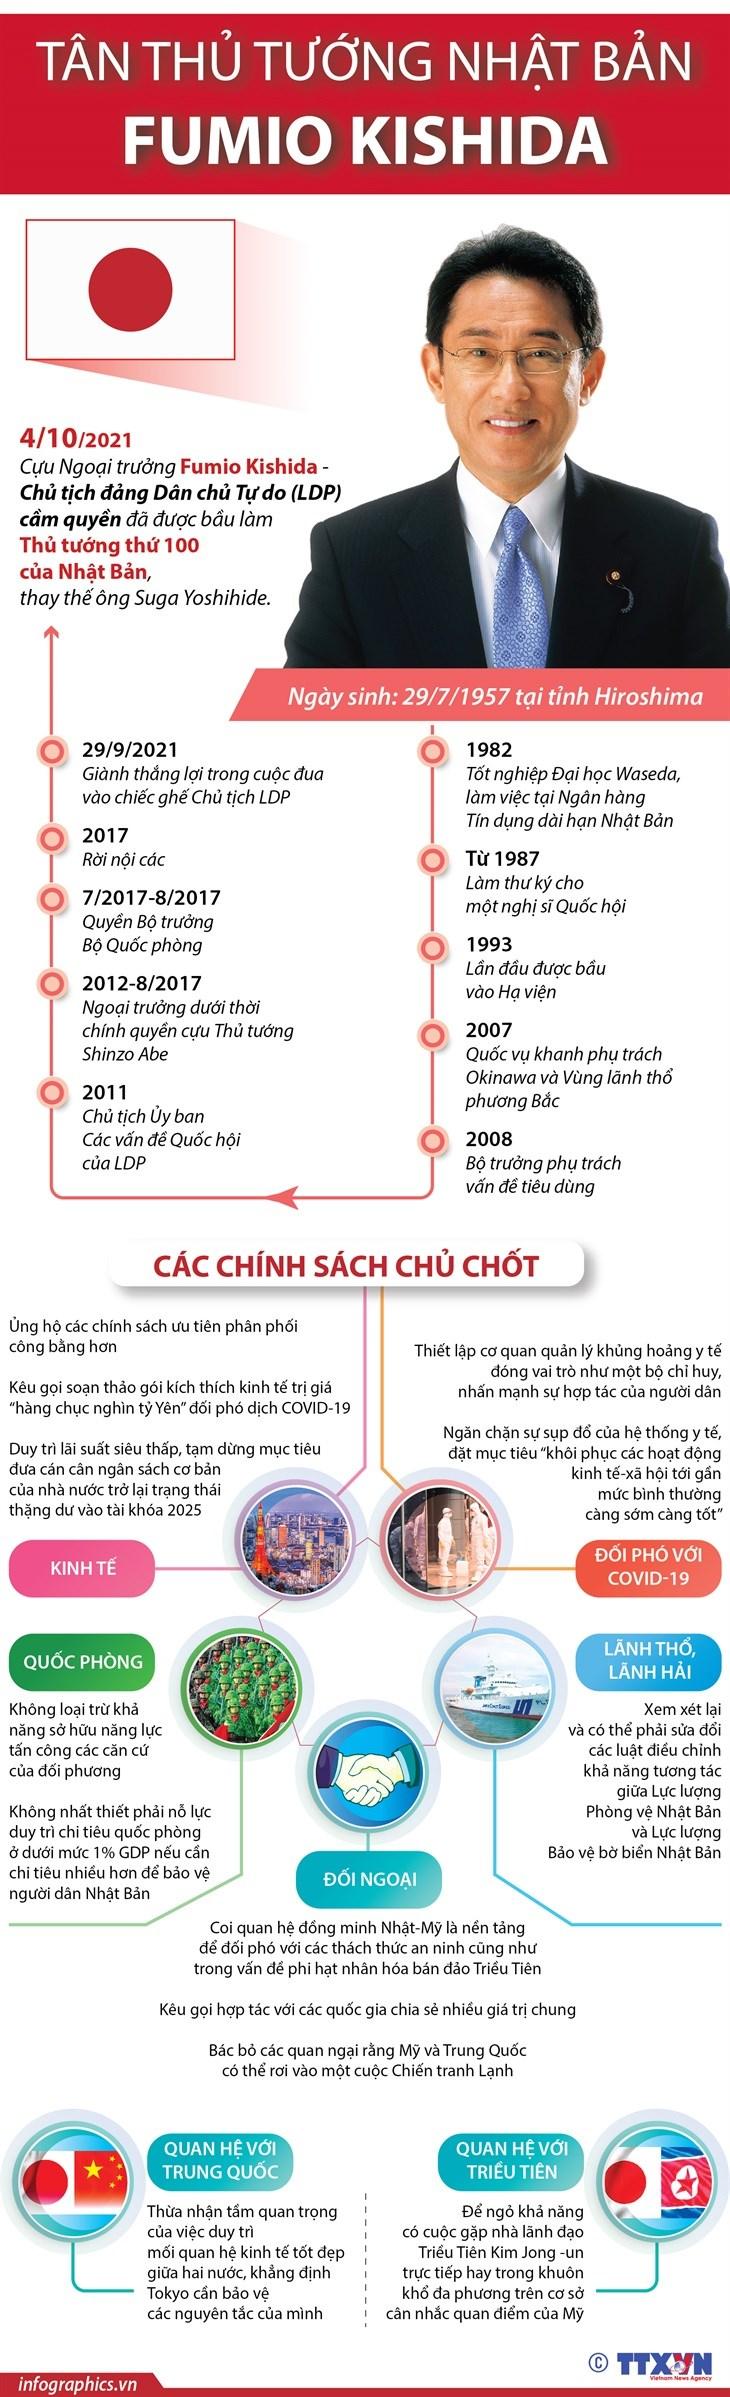 [Infographics] Nhung chinh sach chu chot cua tan Thu tuong Nhat Ban hinh anh 1